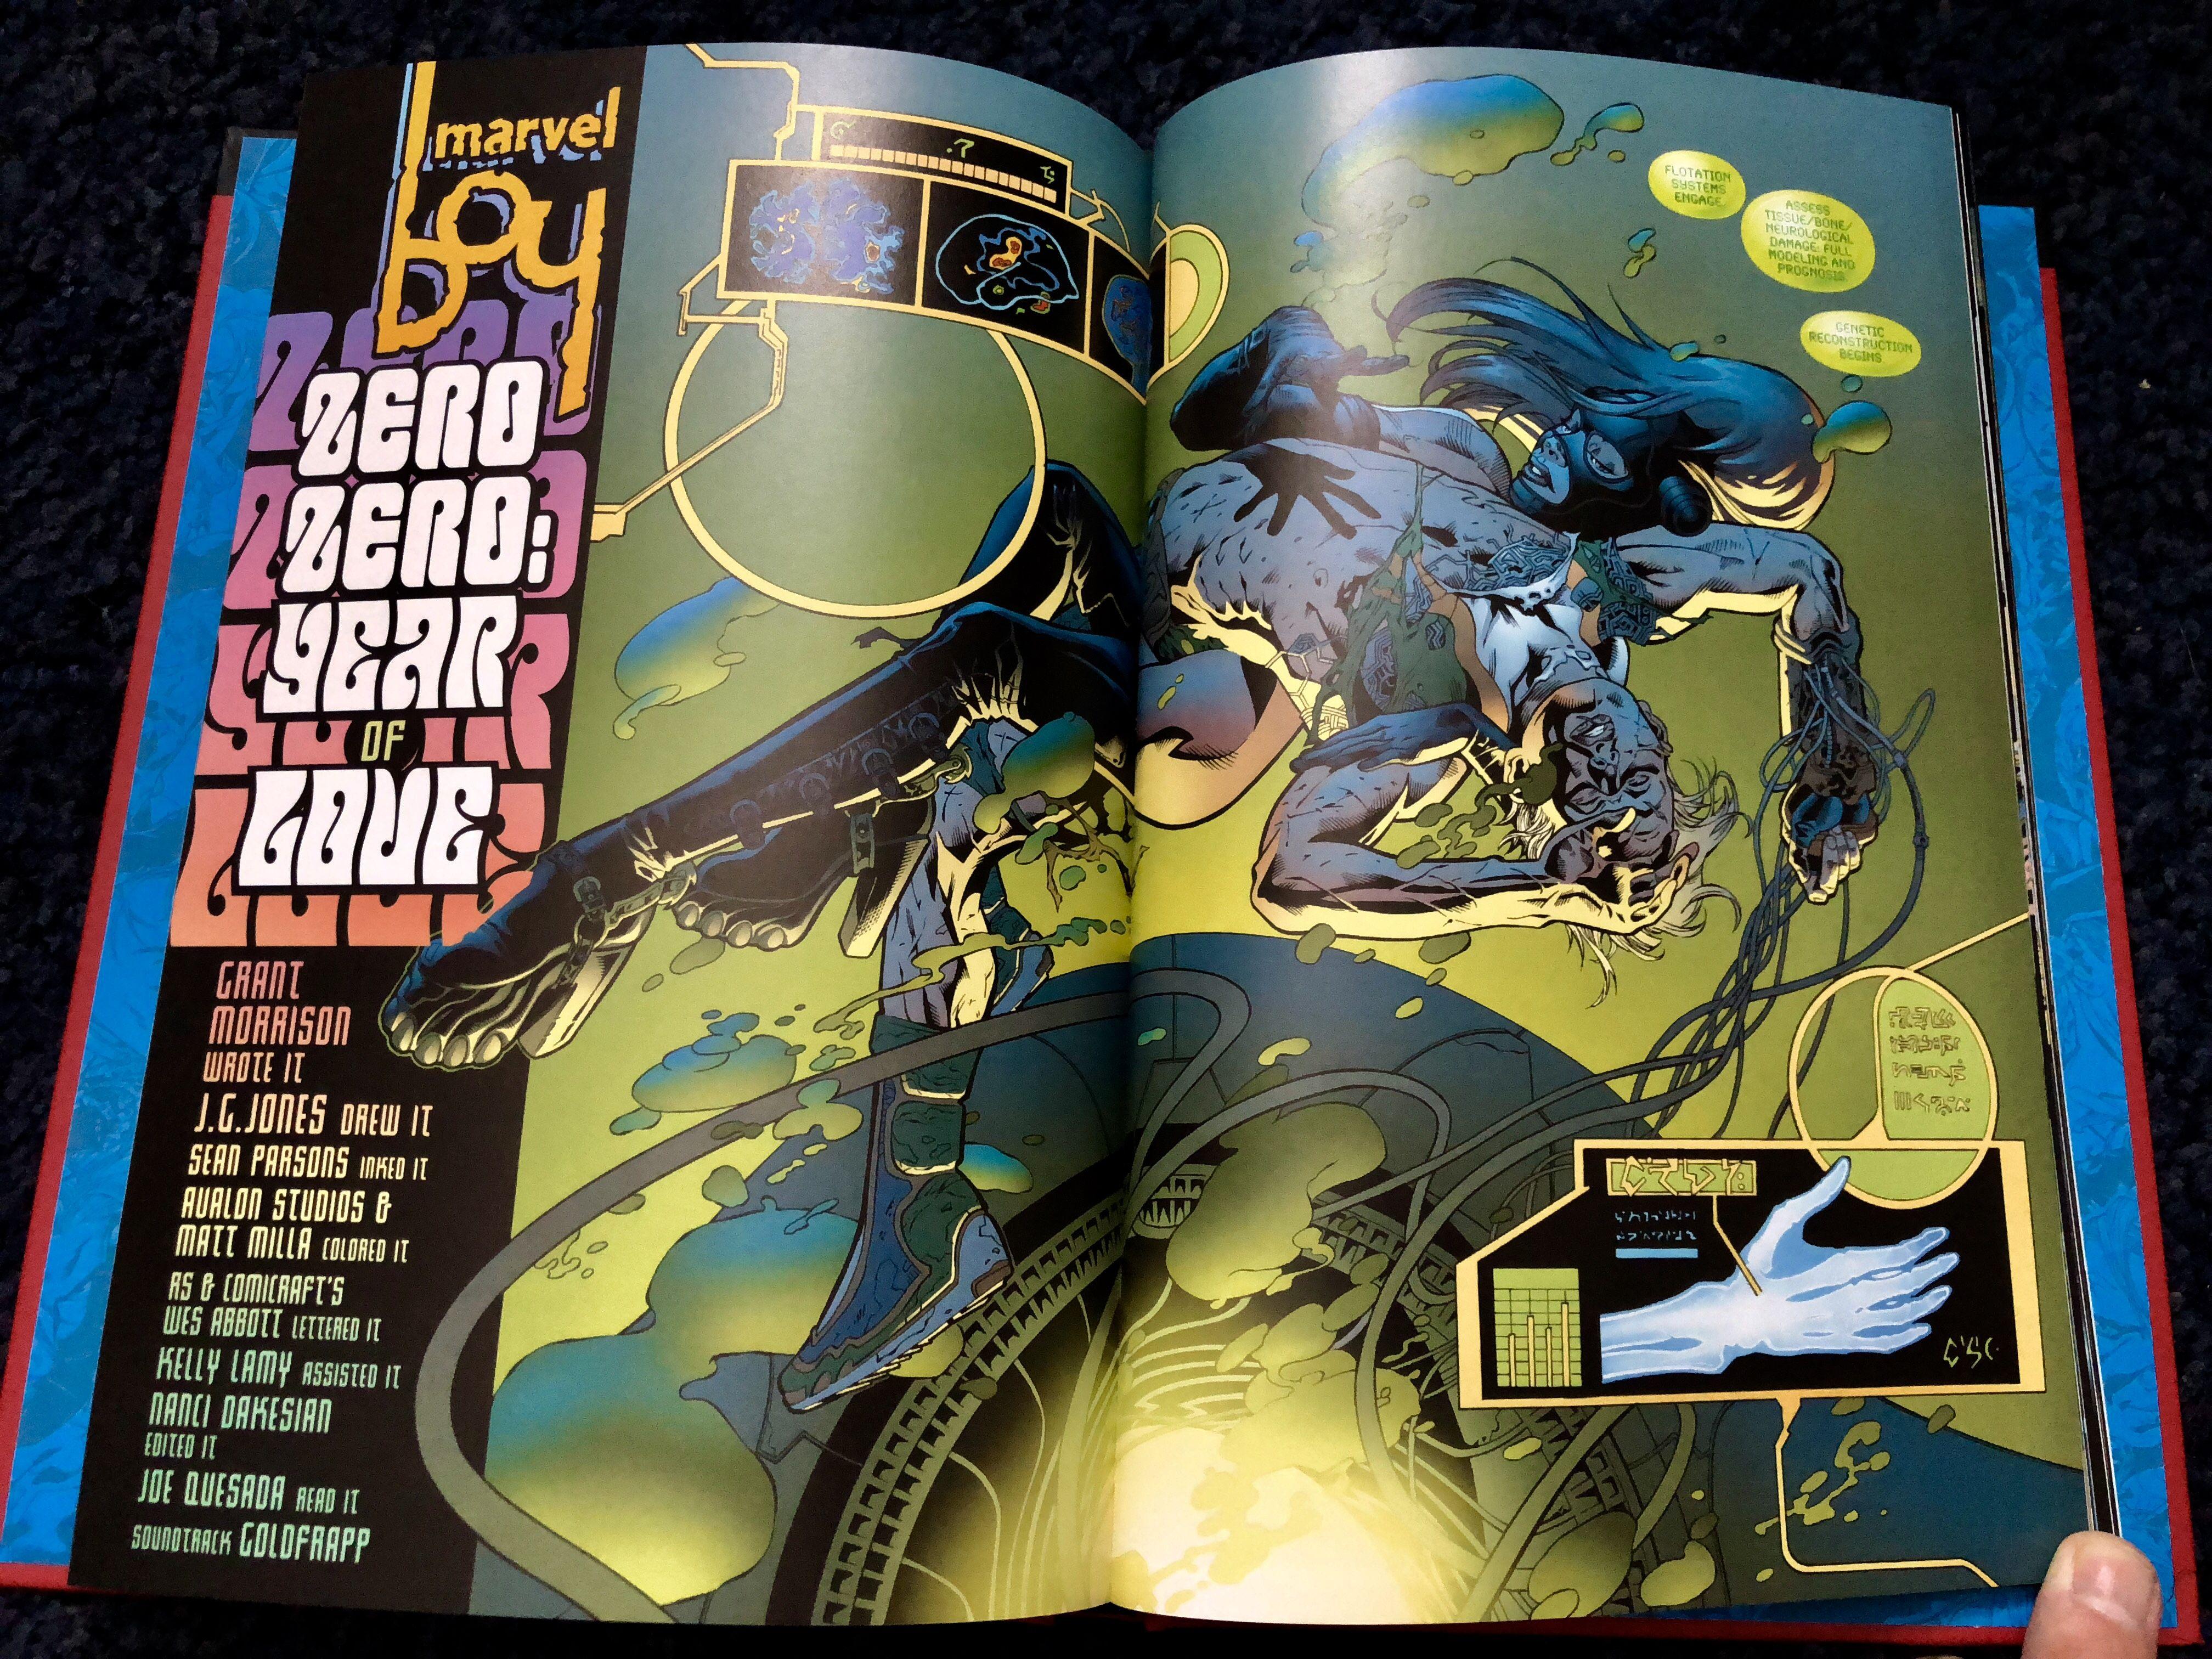 90 Marvel Boy Marvel S Mightiest Heroes Graphic Novel Hachette Partworks 2nd Series Marvel Graphic Novel Novels